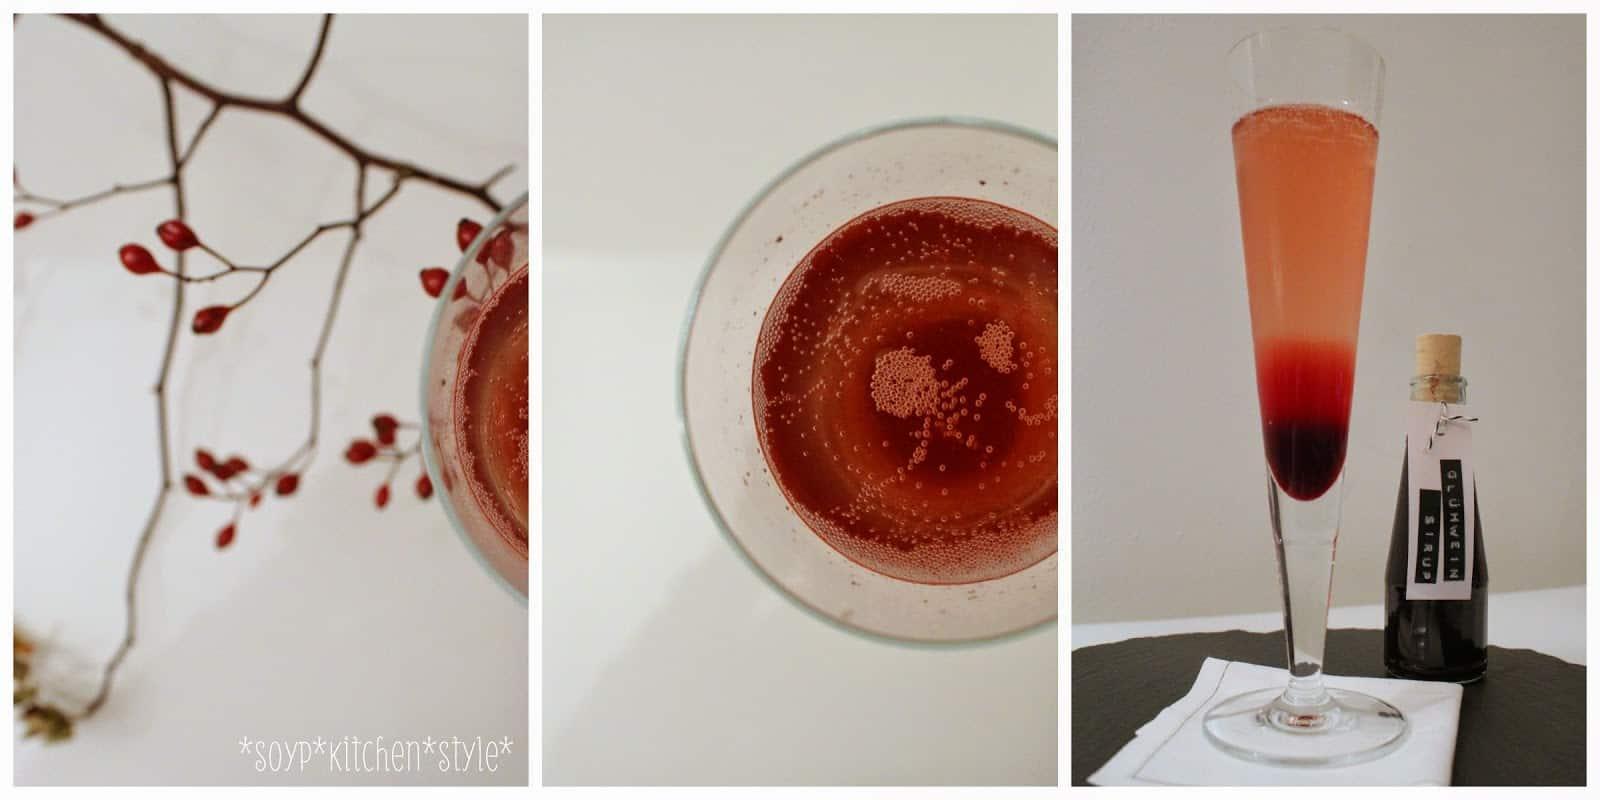 Glühwein Sirup | SOAP|KITCHEN|STYLE